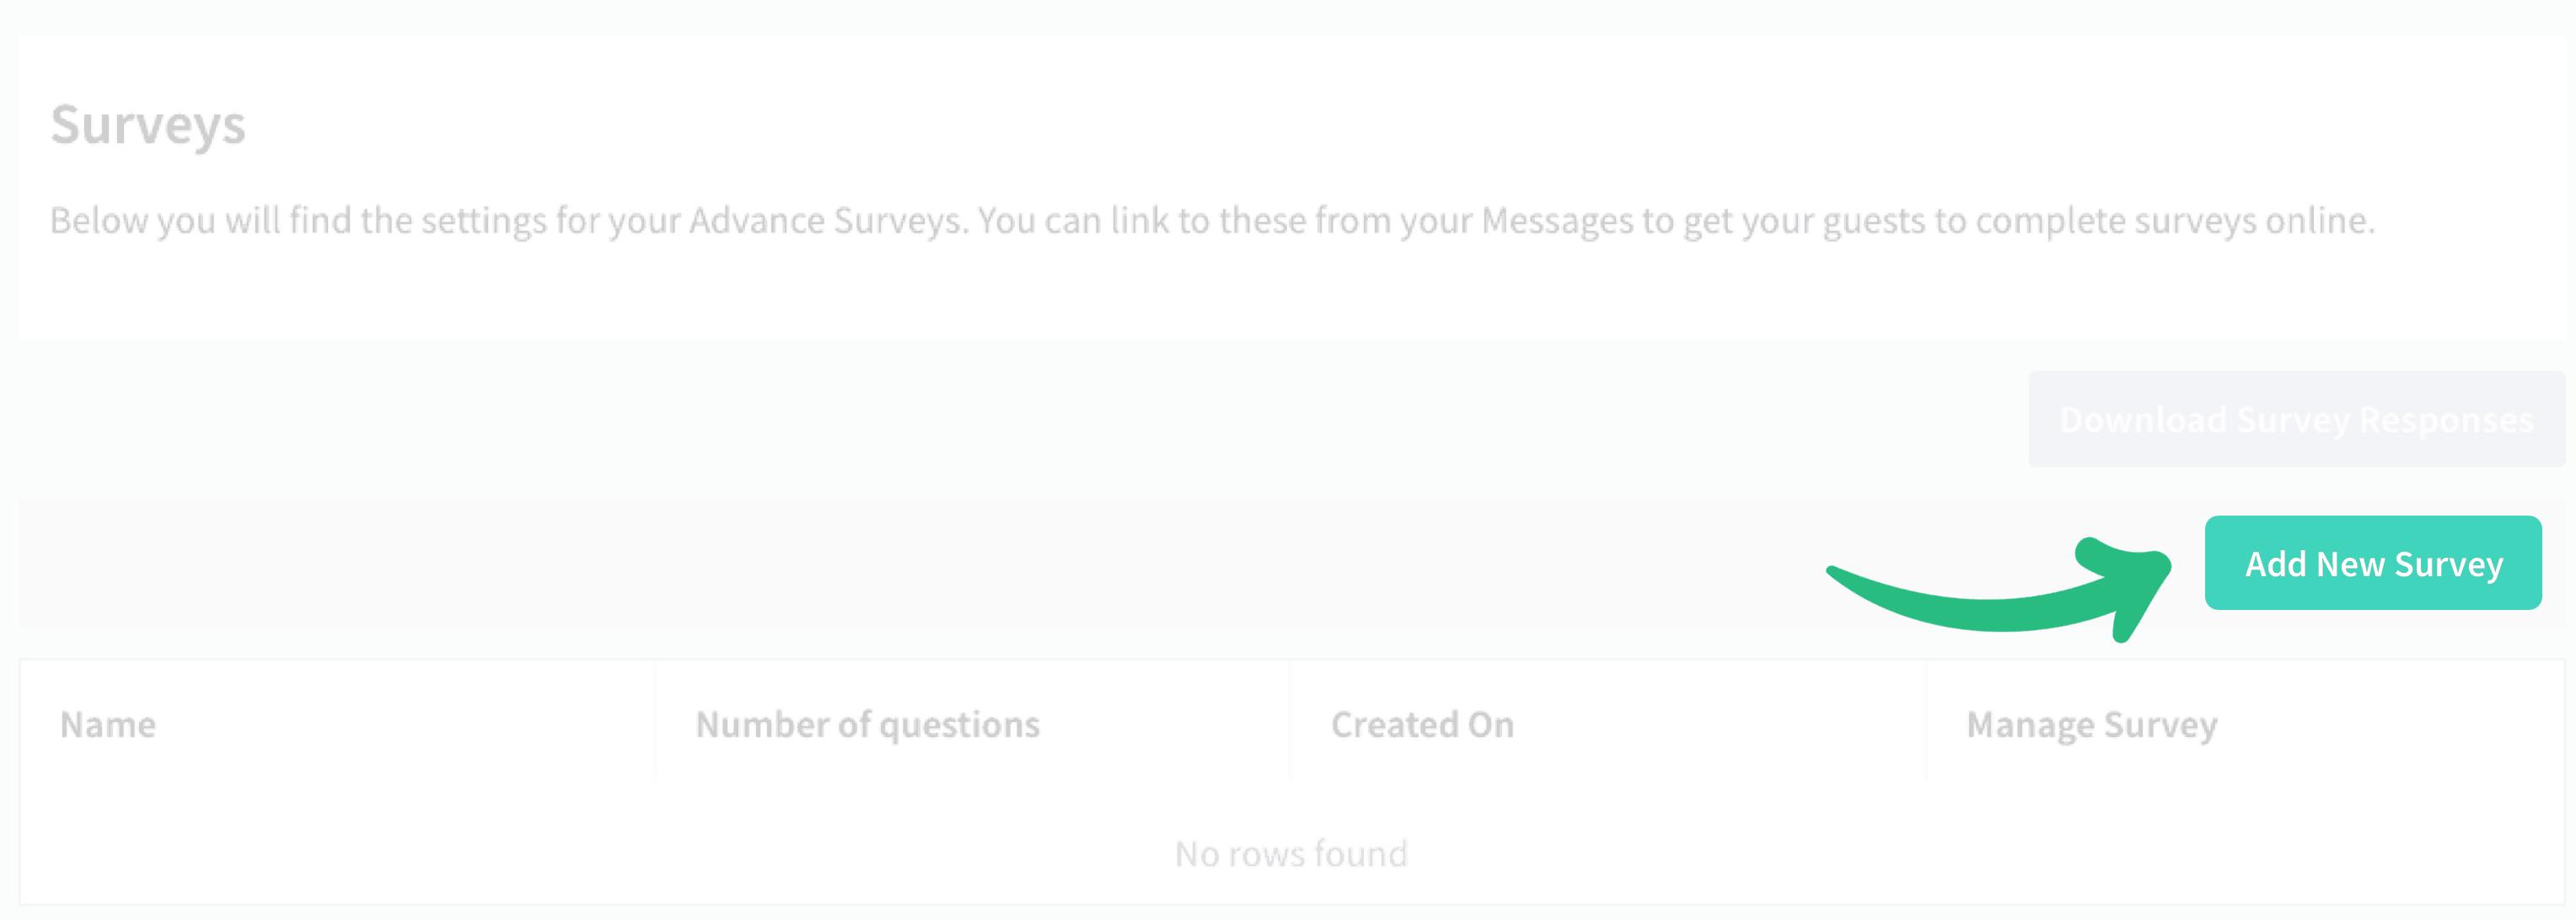 Downloading survey information